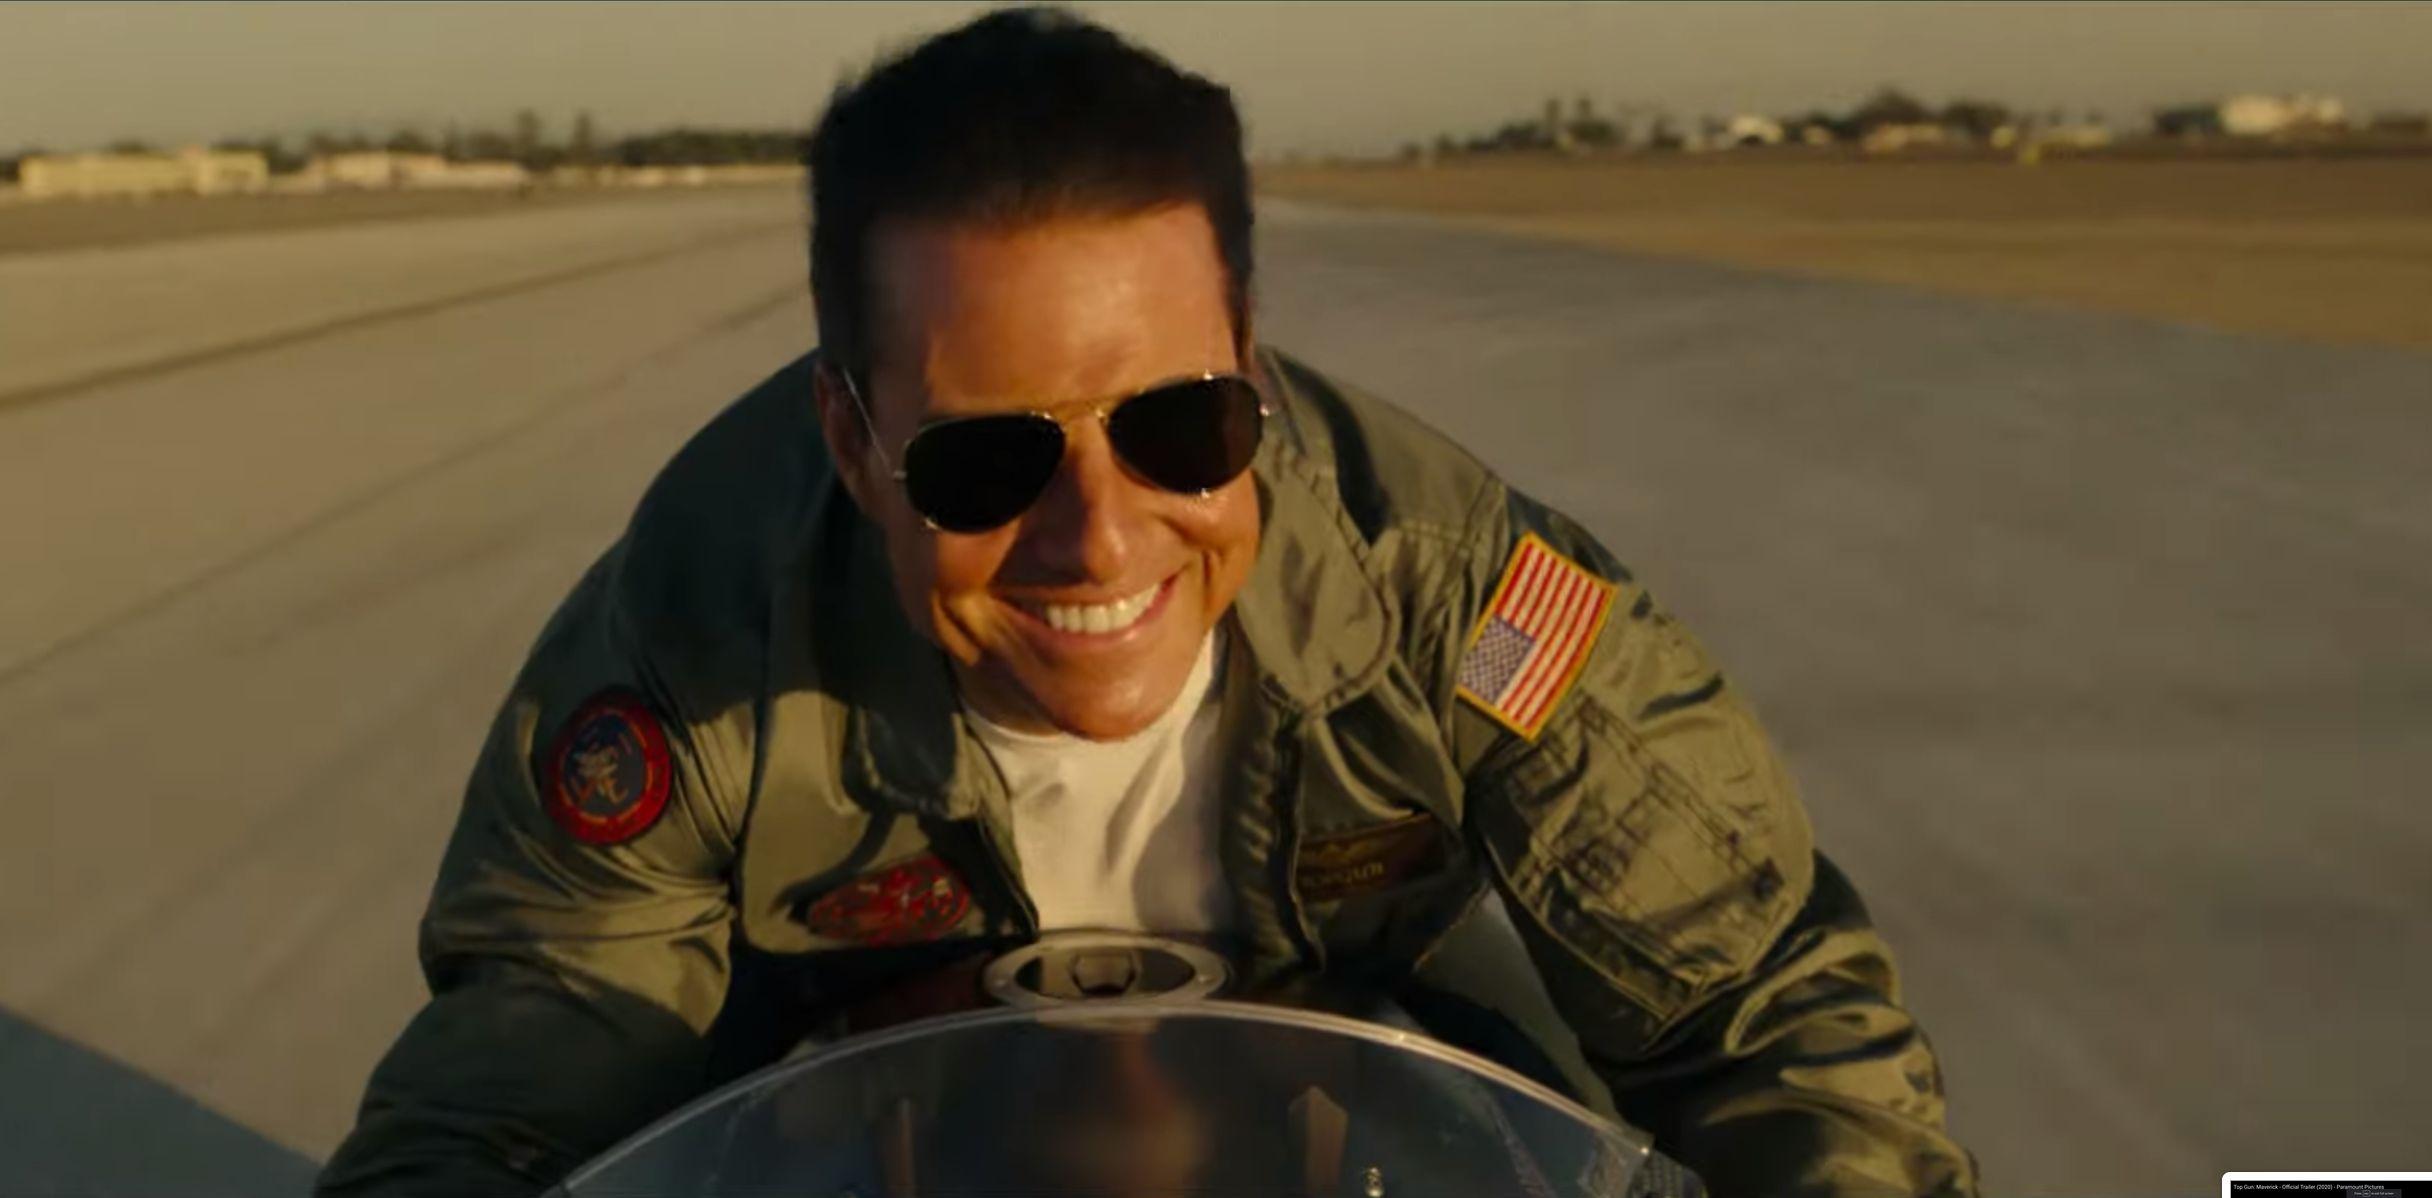 Tom Cruise Returns To The Danger Zone In First 'Top Gun: Maverick' Trailer